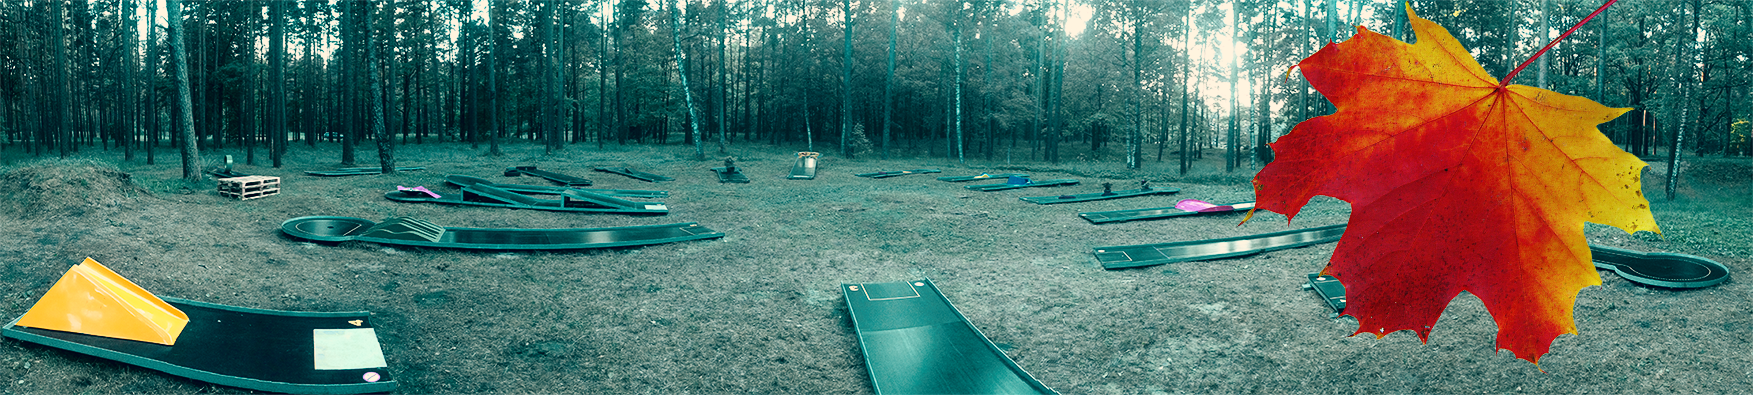 minigolfa_laukumi_mezaparks_play4score_rudens